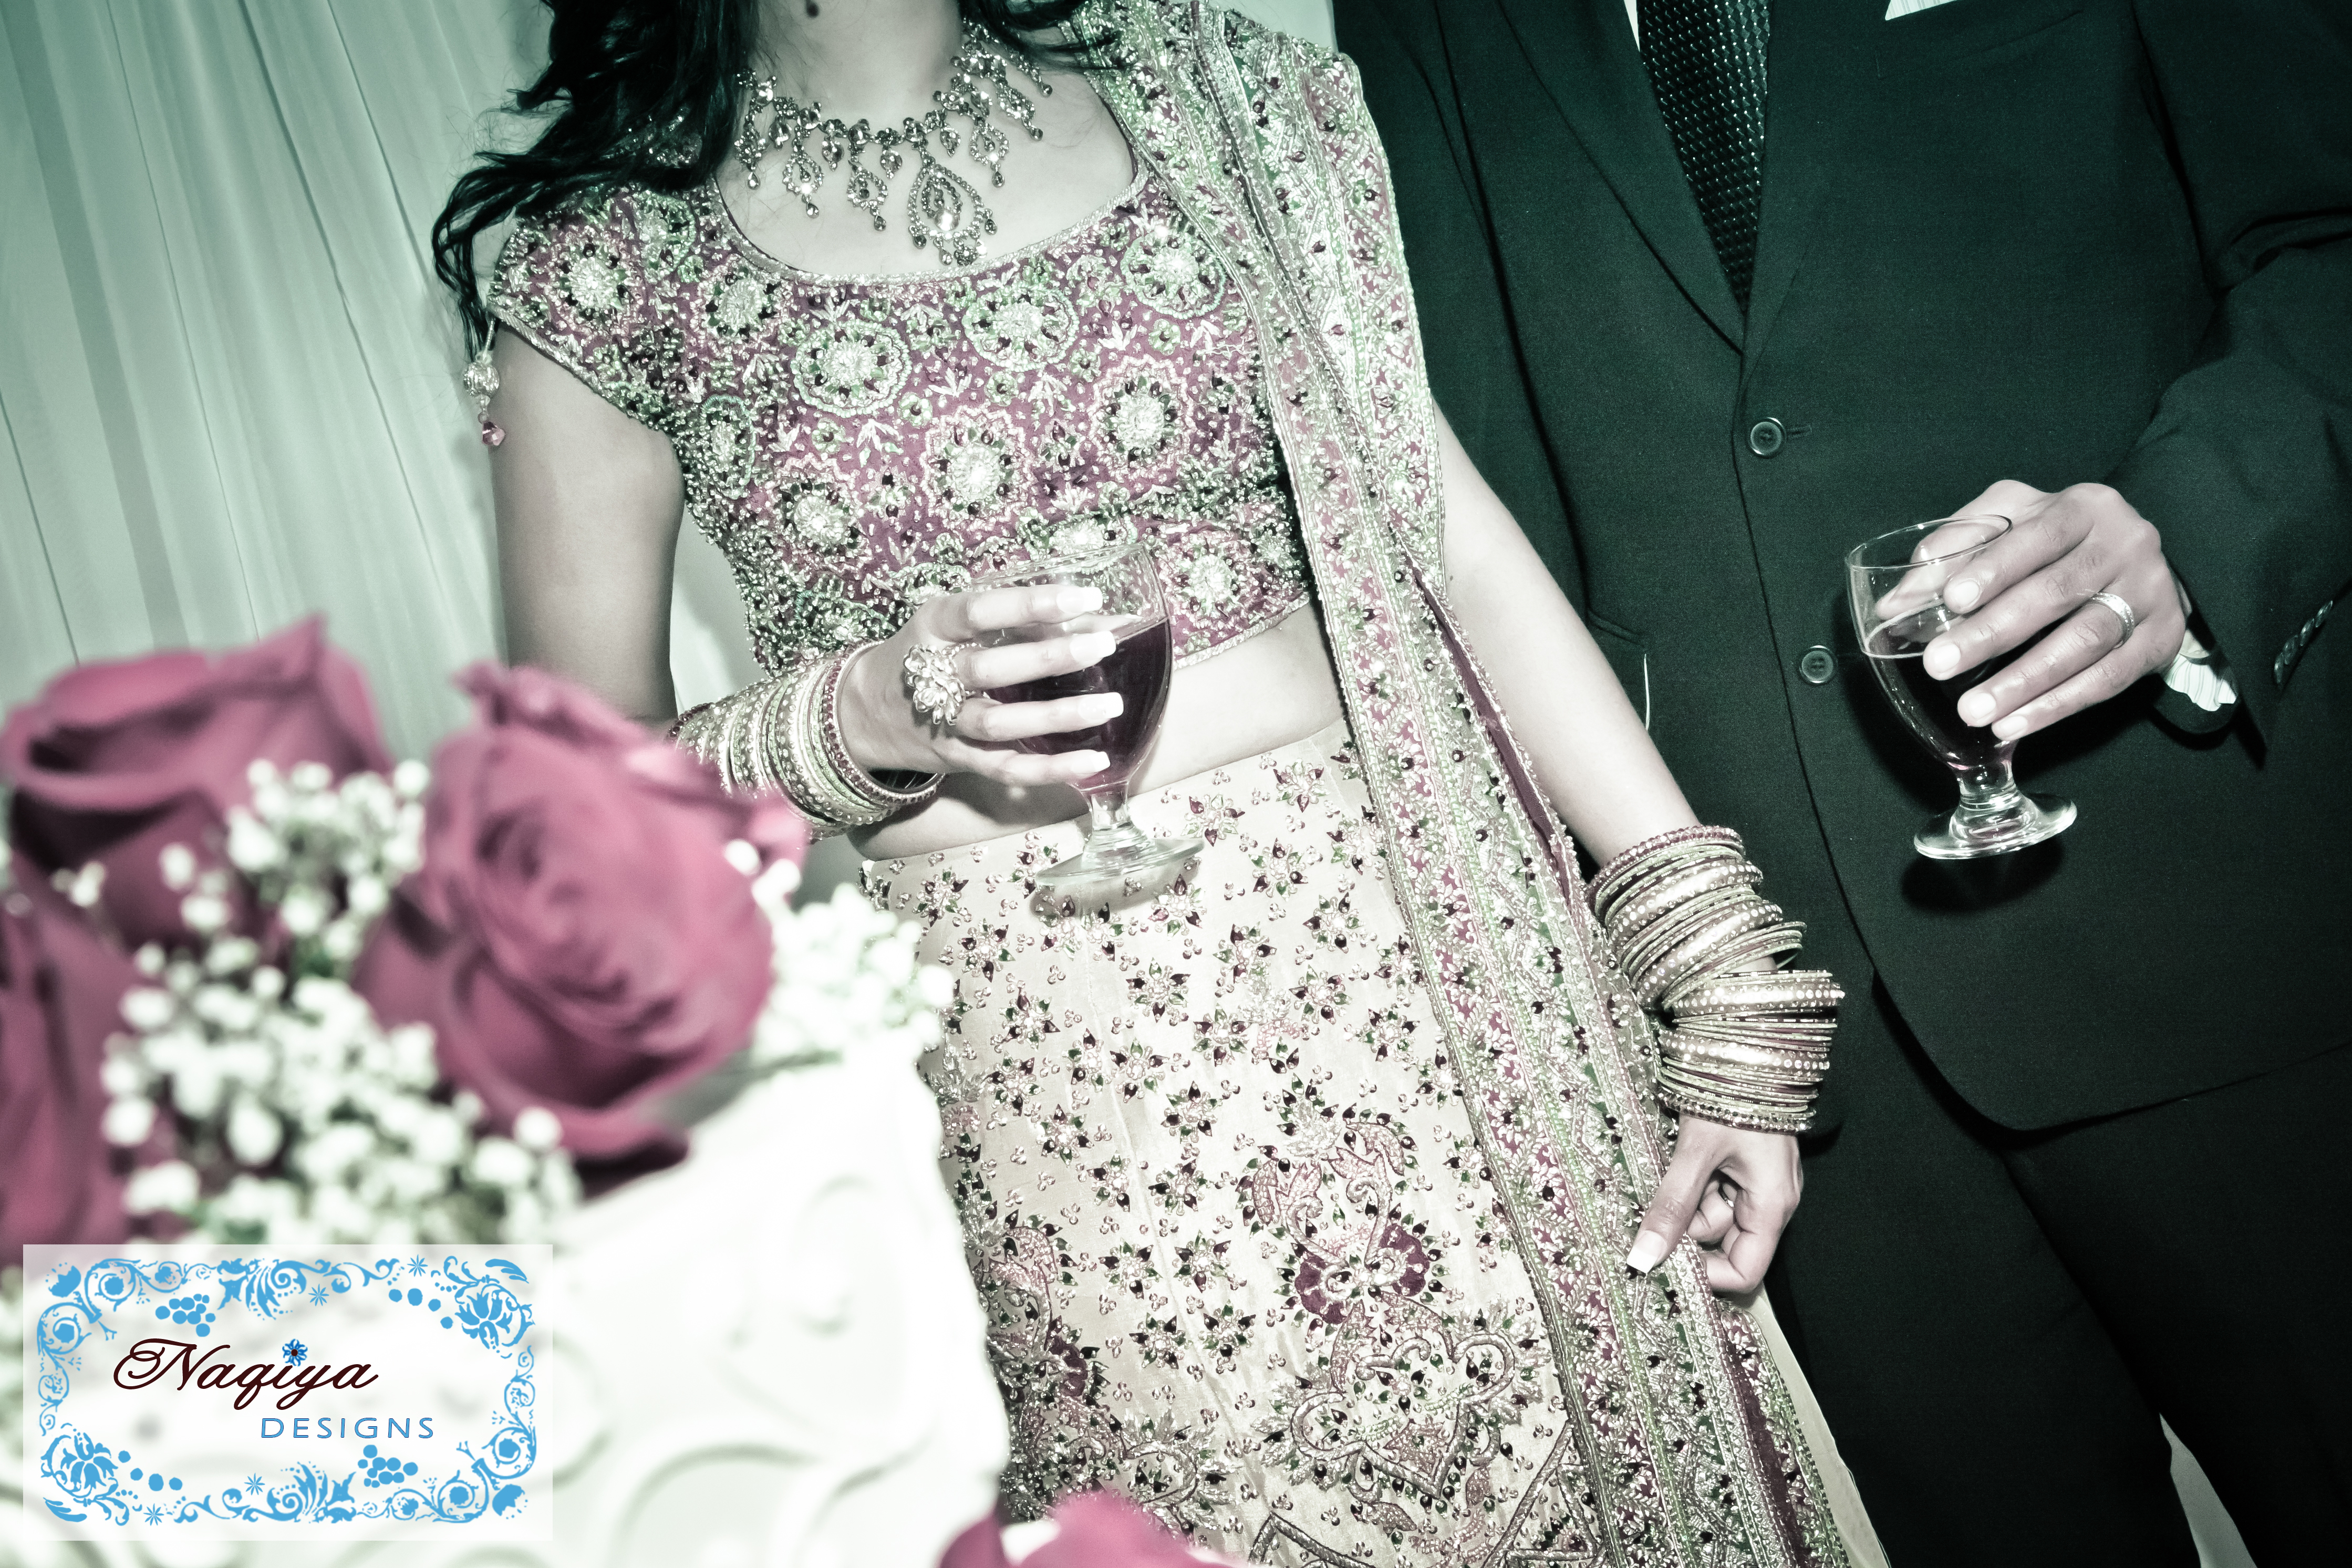 Naqiya Designs 187 Bay Area Wedding Photographer Beautiful